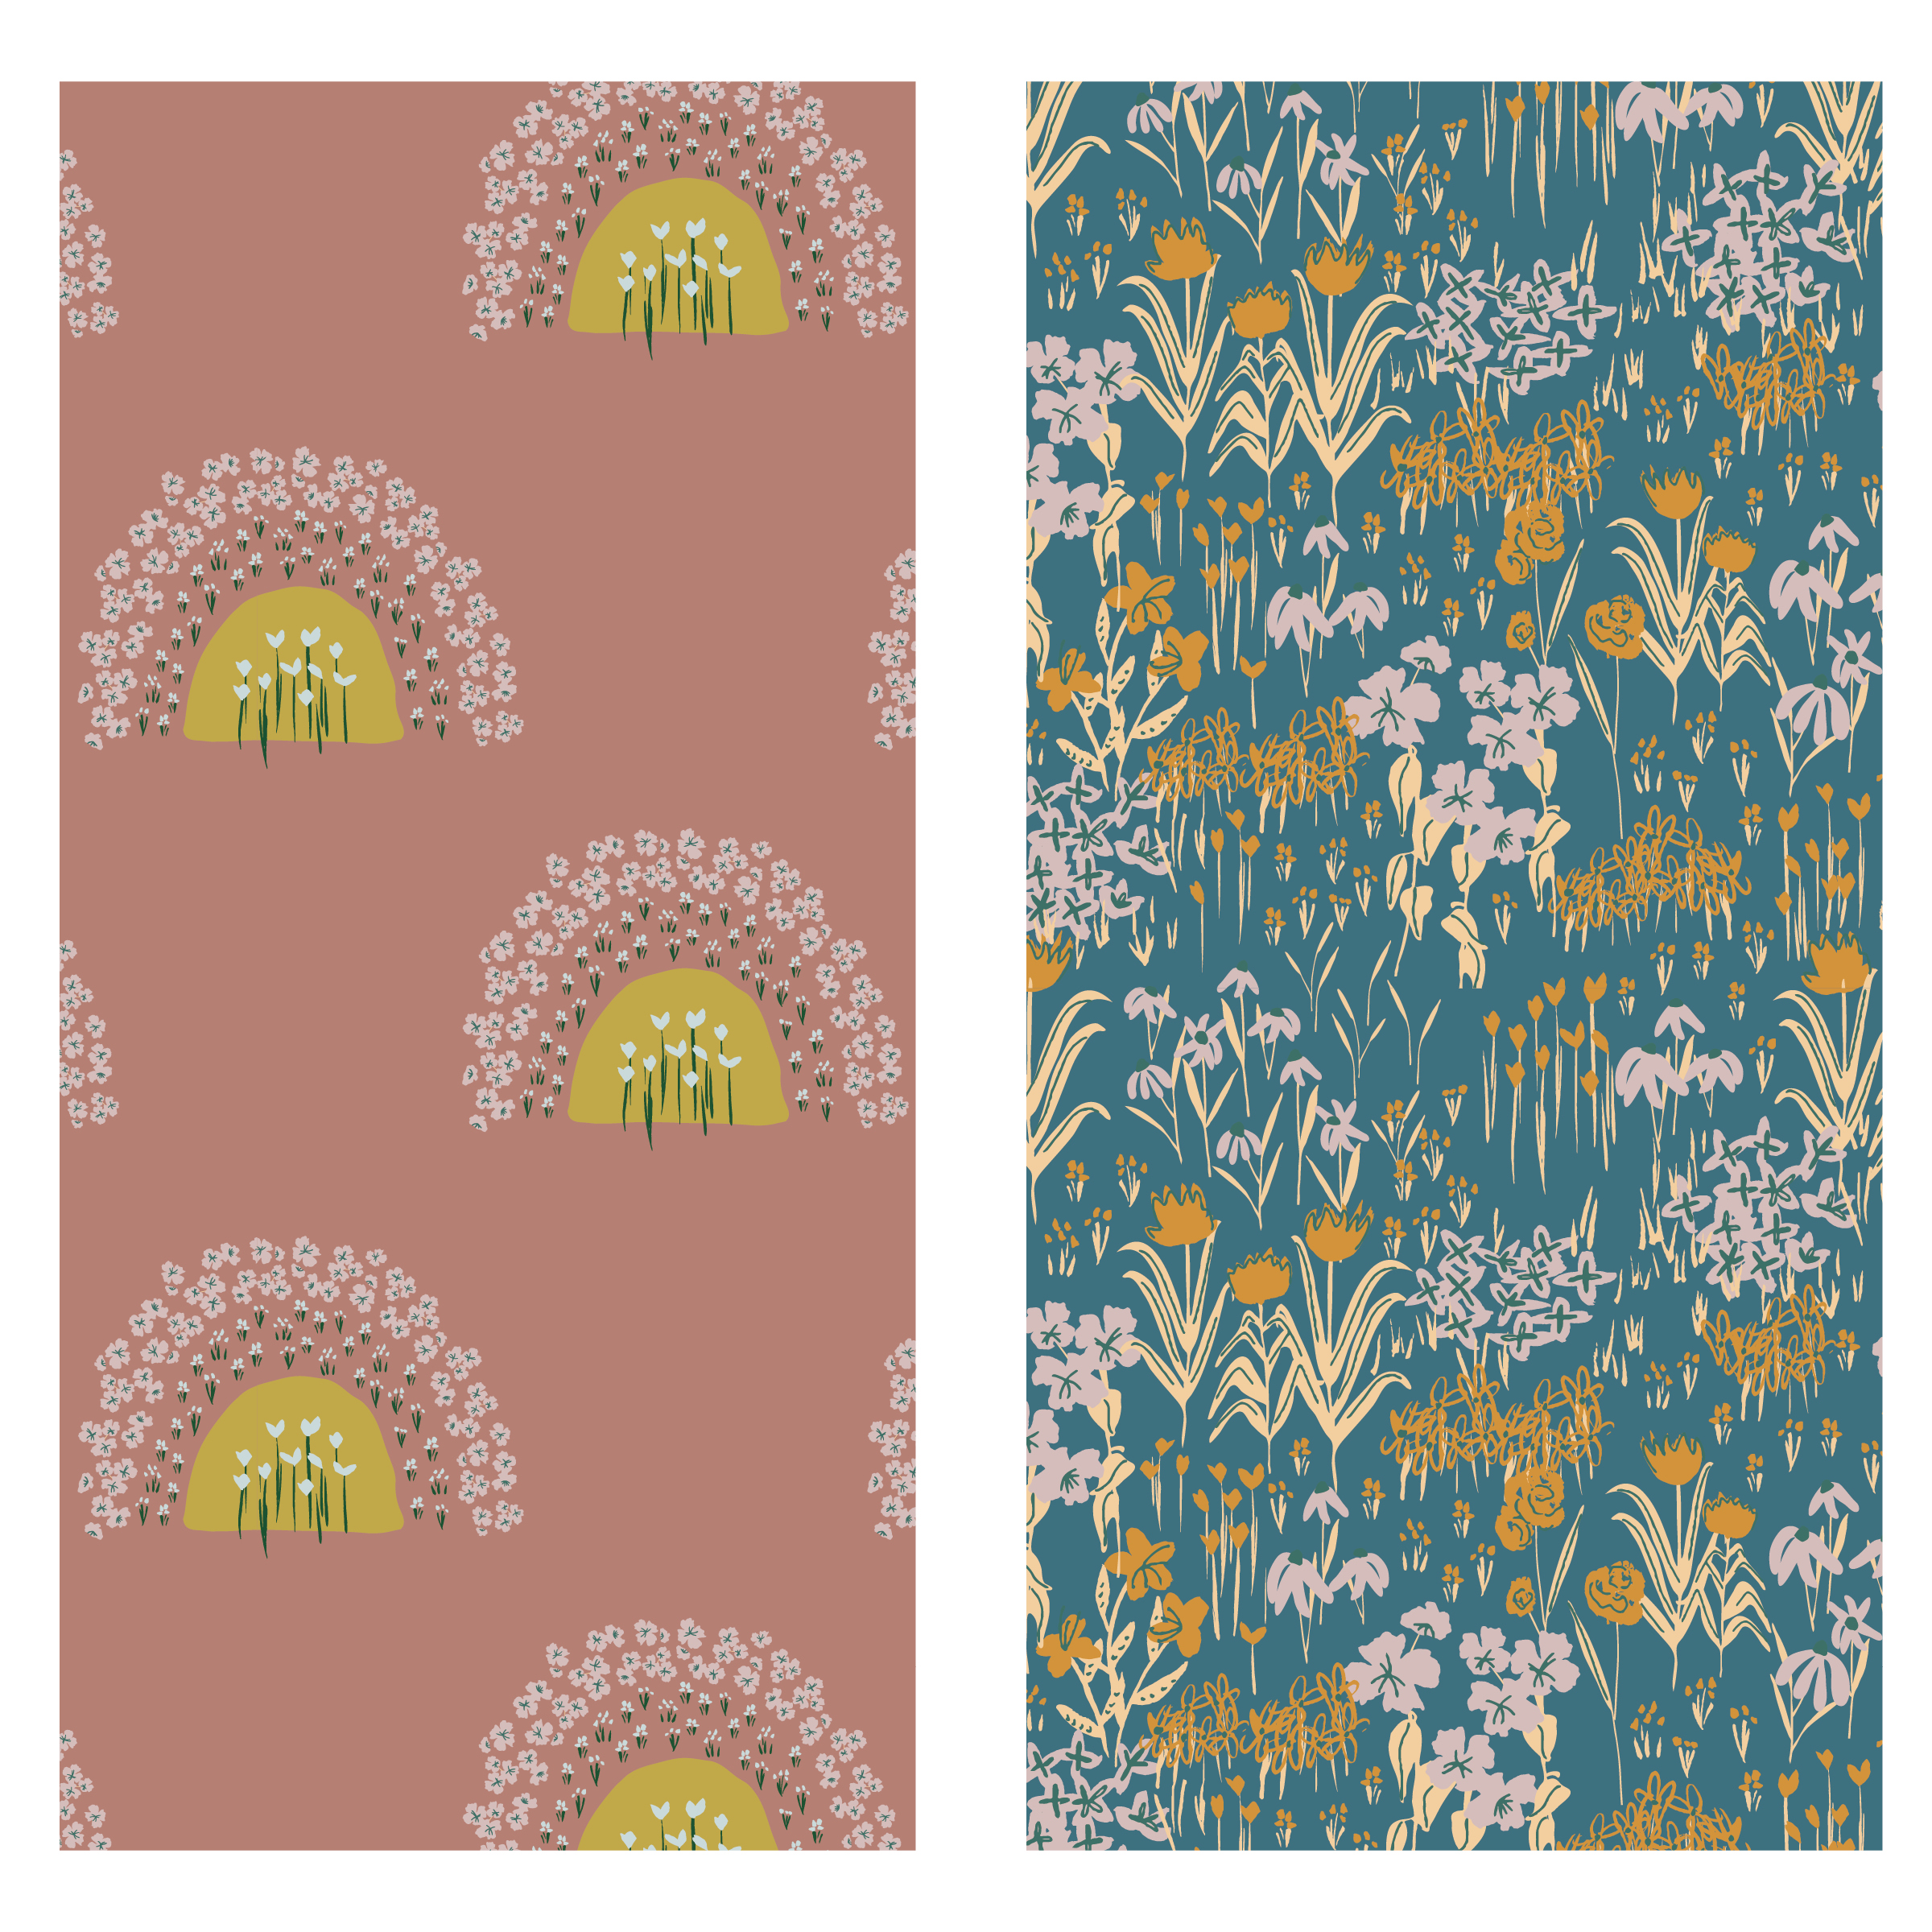 by HOPE johnson surface pattern design_pattern pair162.jpg